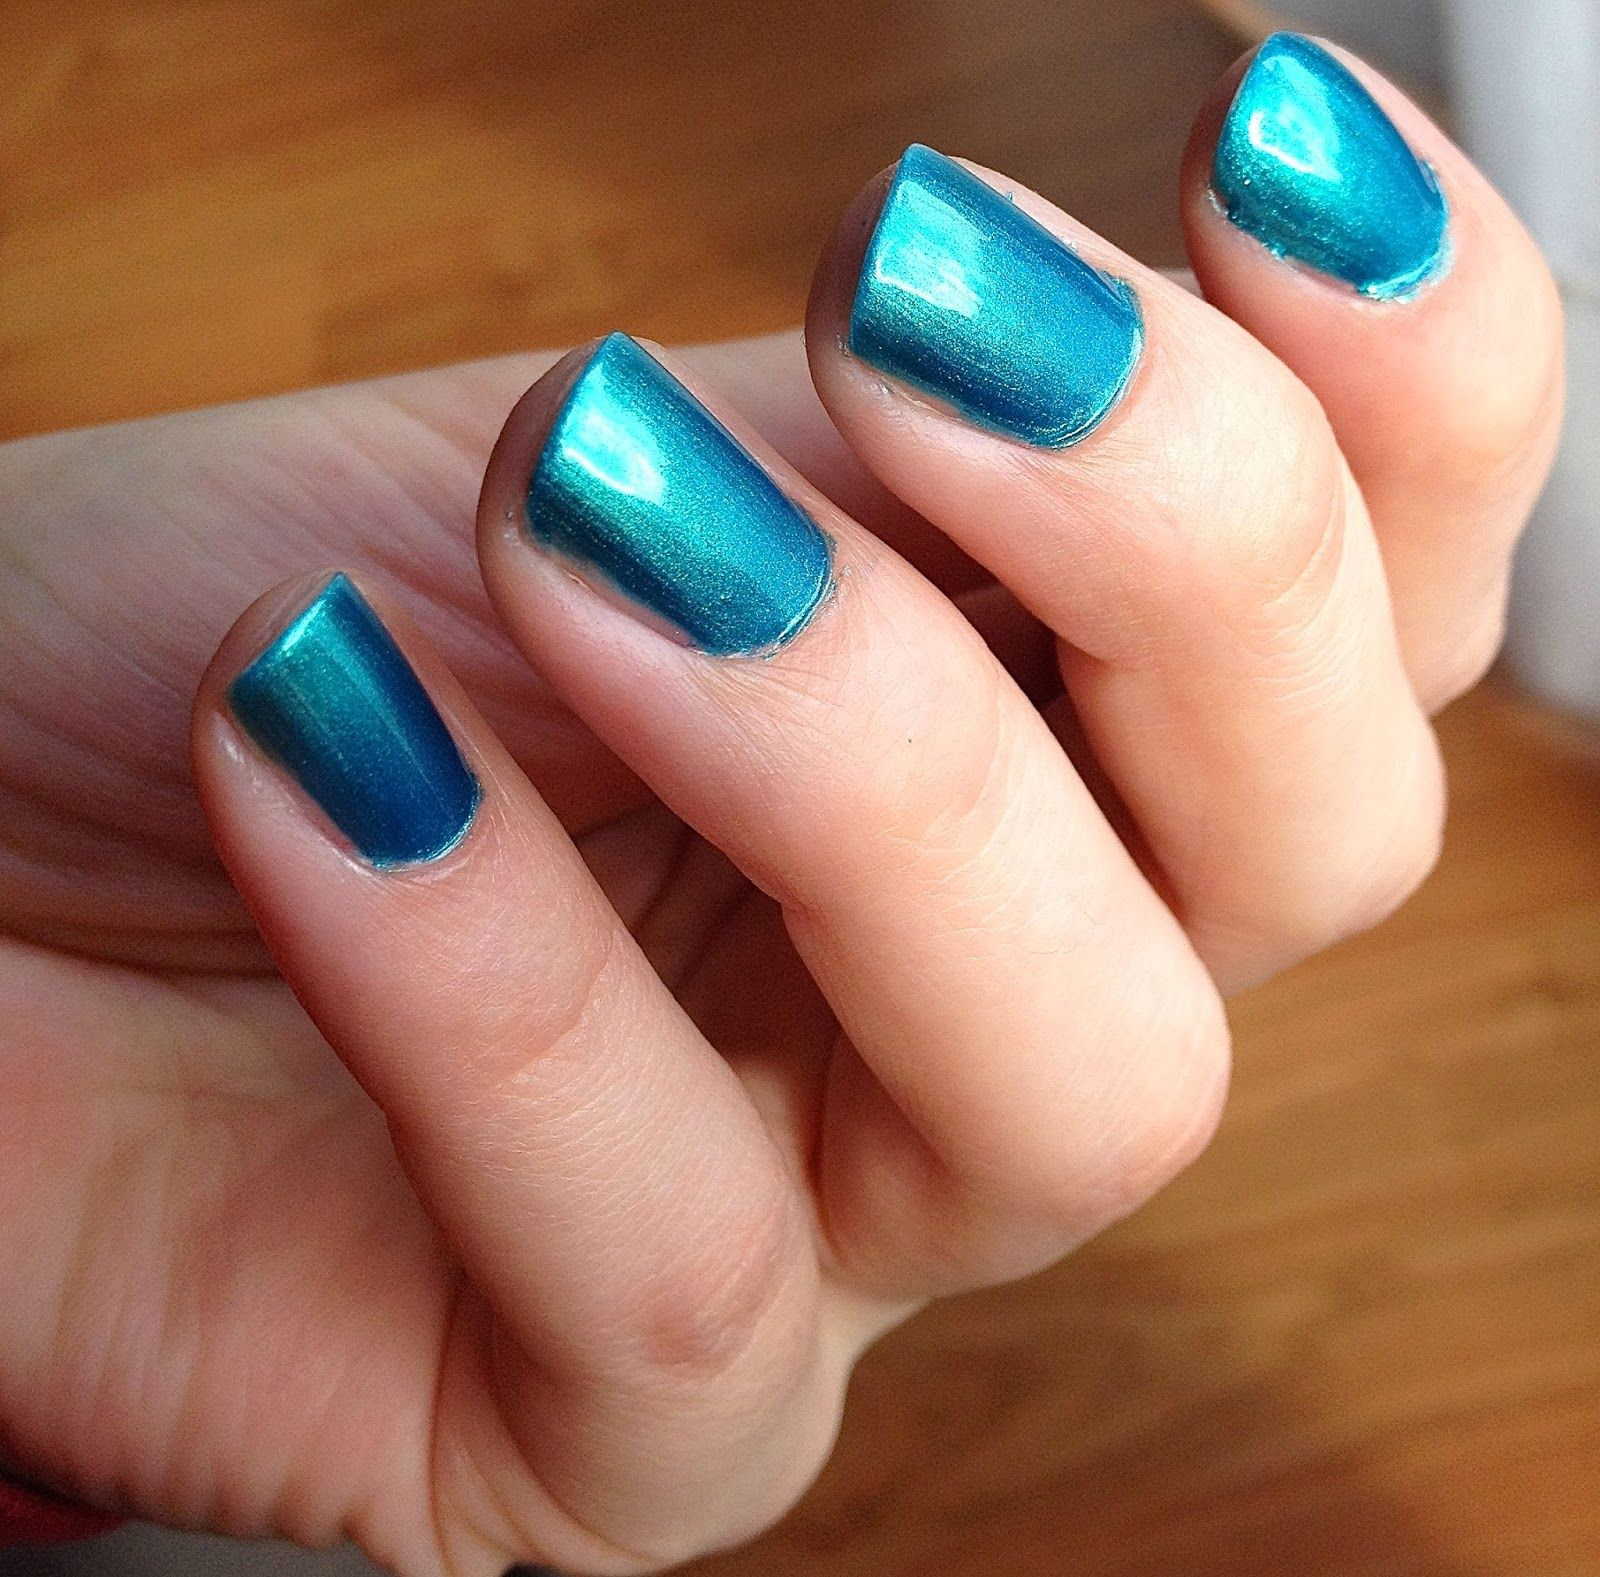 #lovenails #amazingnails #nail #nailstodiefor #nailgems #nailed #naillove #manipedi #nailart #nailtechnician #blingnails #prettynails #diamondnails #nailedperfection  #beautiful #cute #fashion #art #beauty #nails #unhas #love #polish #nailsaddiction #makeup #nailsoftheday #notd #nailart #love #loveit